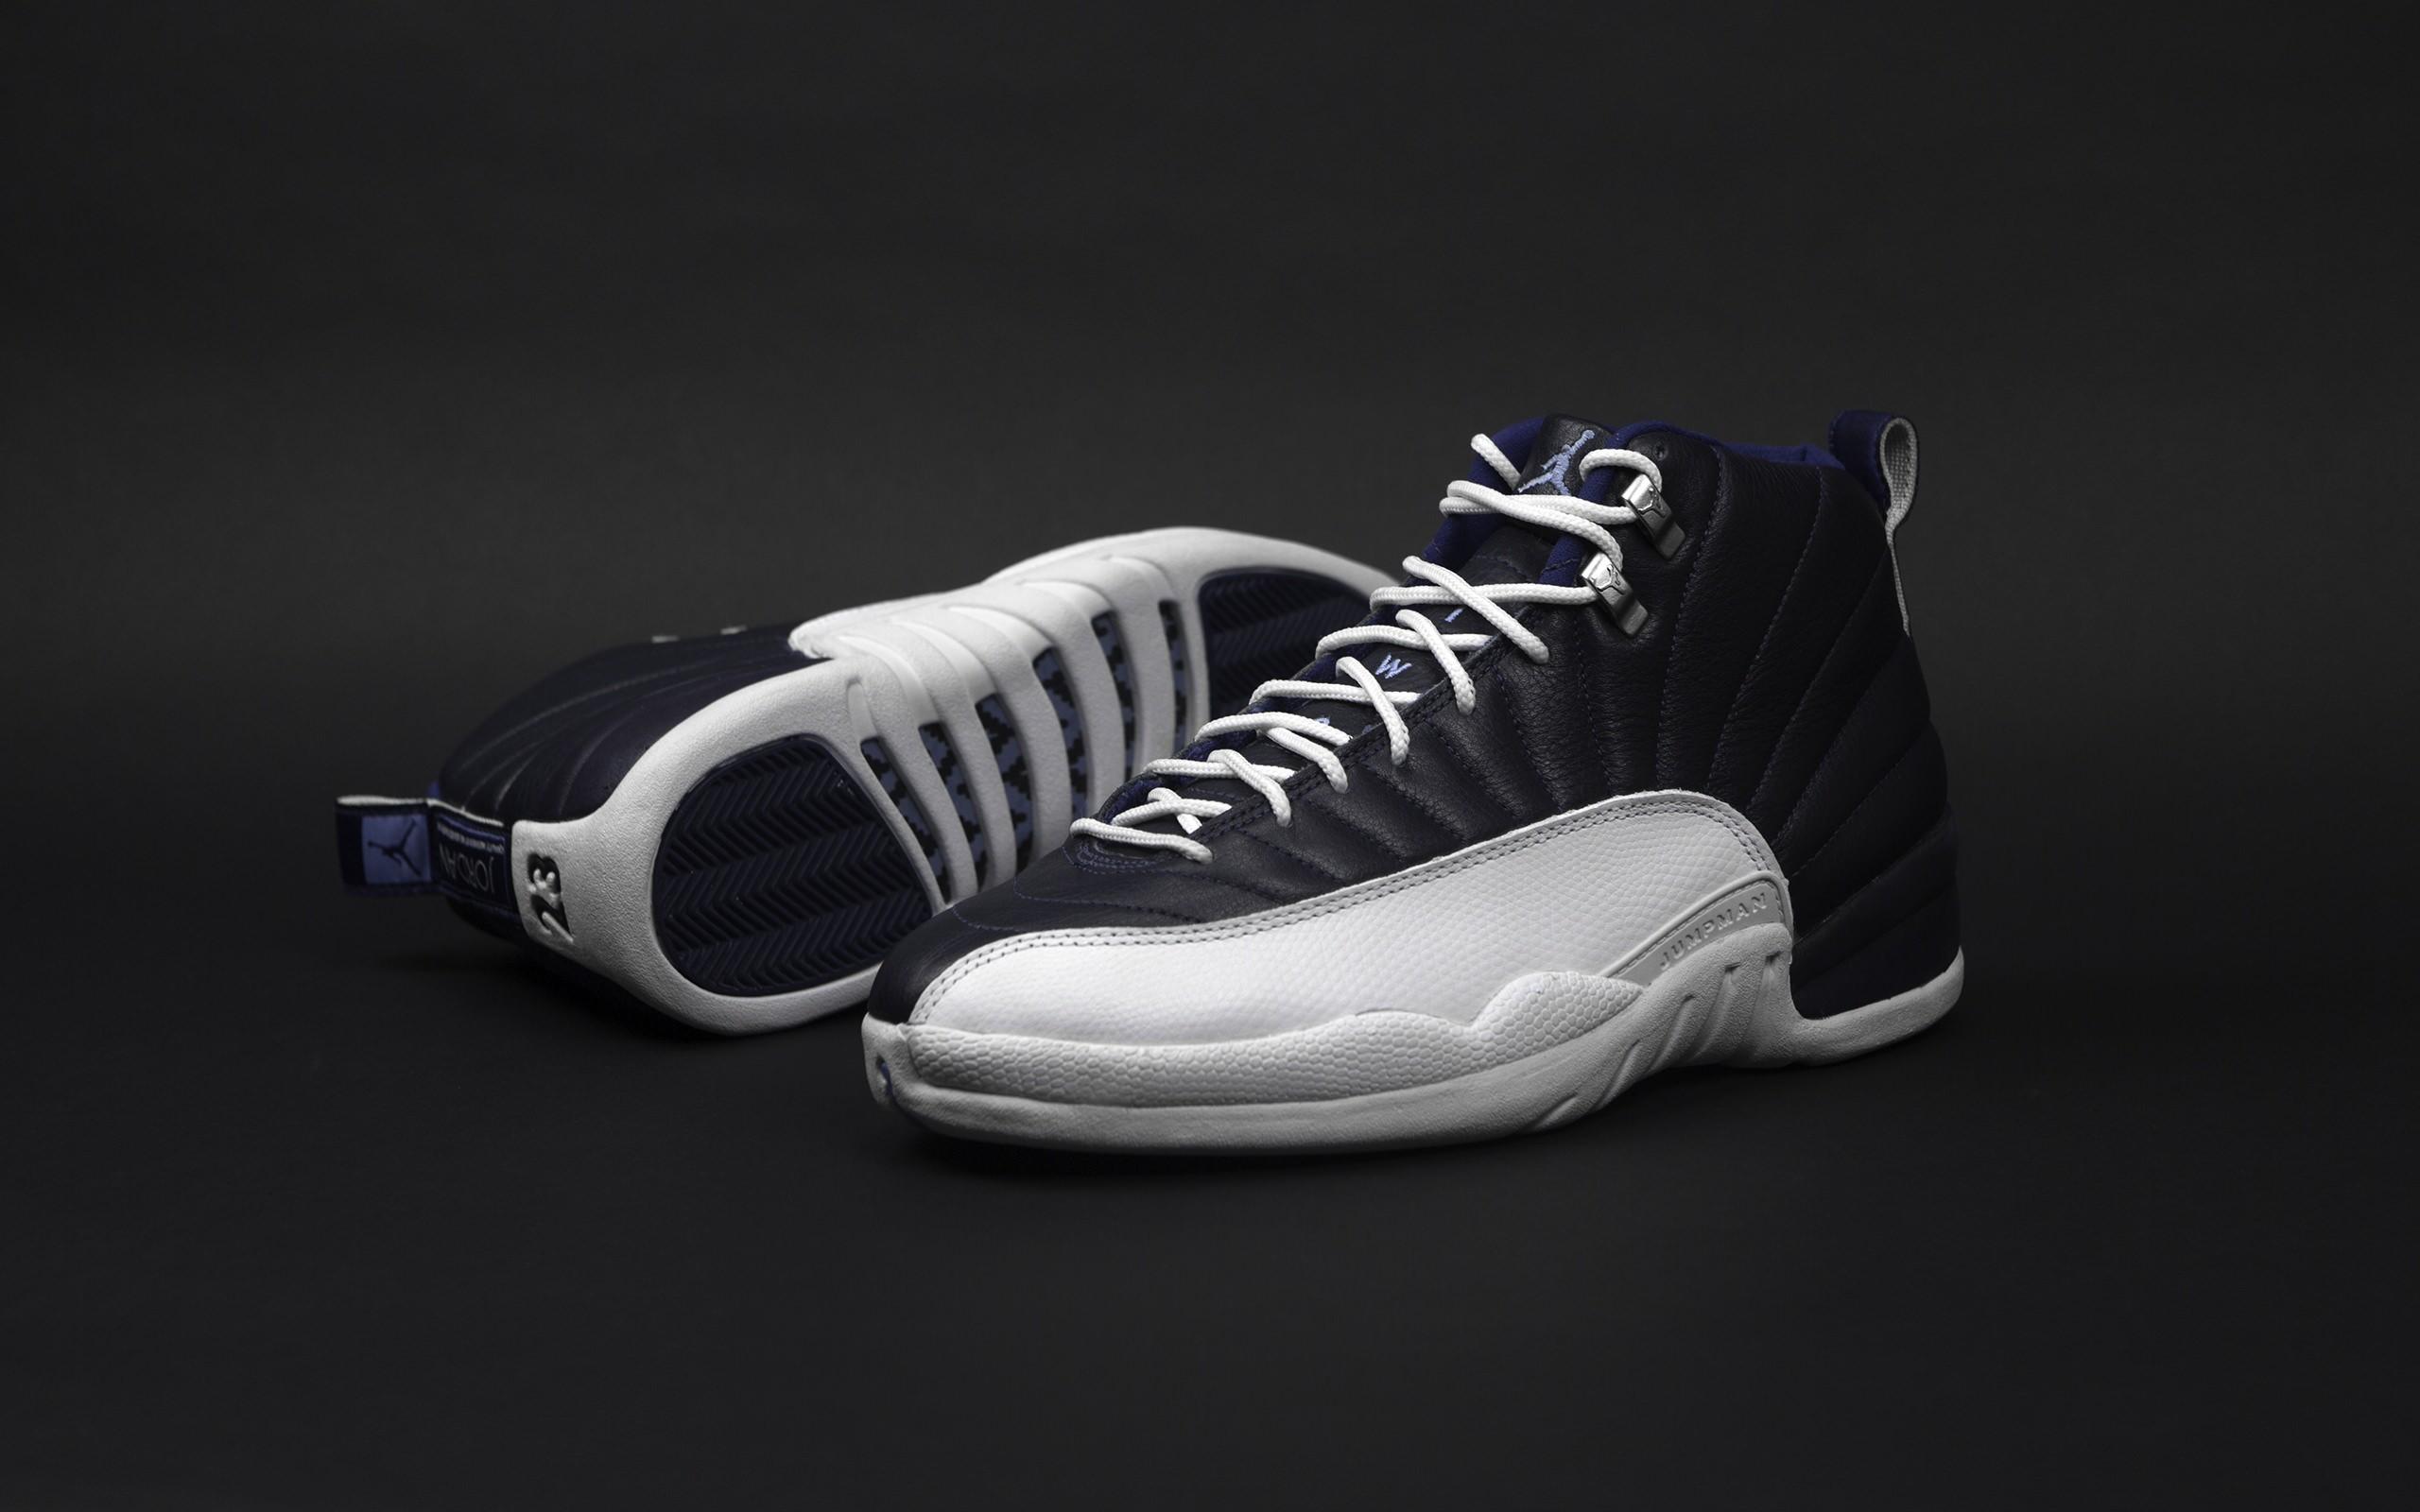 Nike Shoes Wallpapers Desktop 60 Images